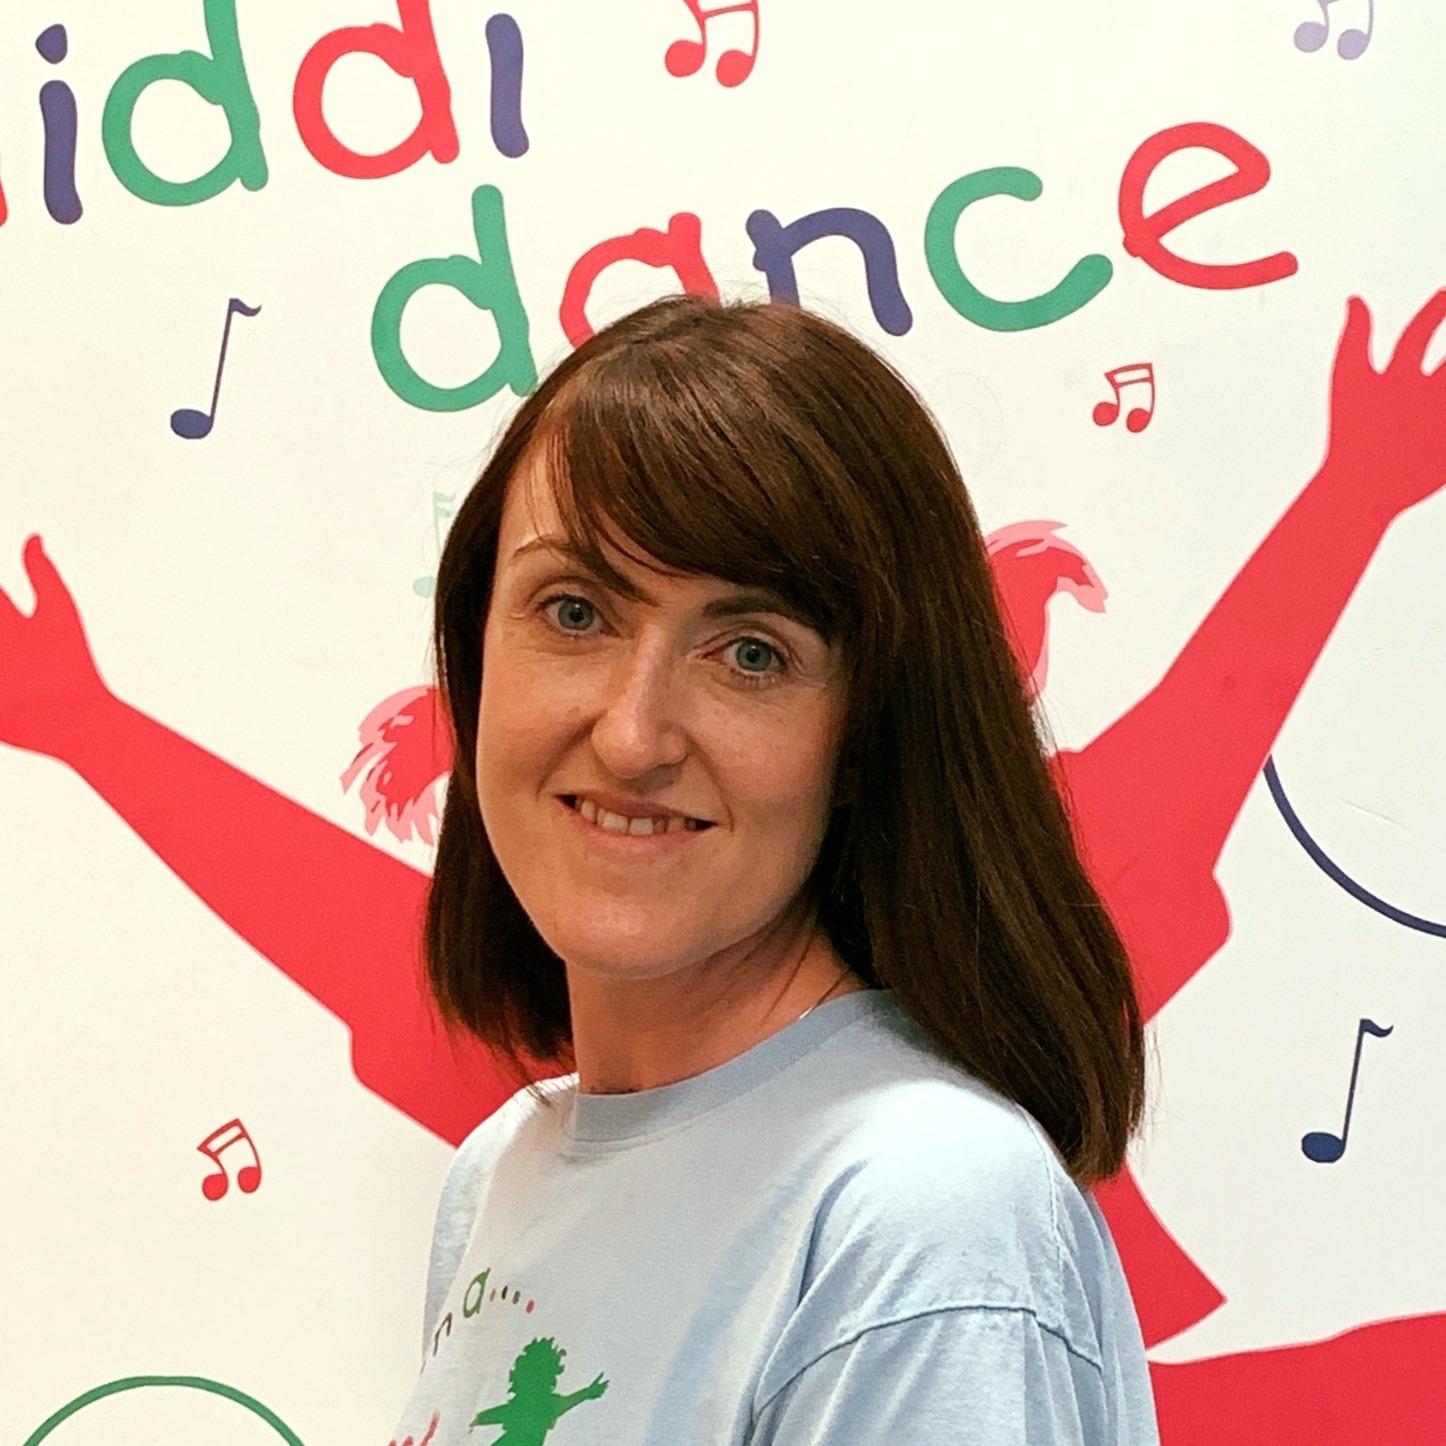 diddi dance Shrewsbury and South Telford's logo